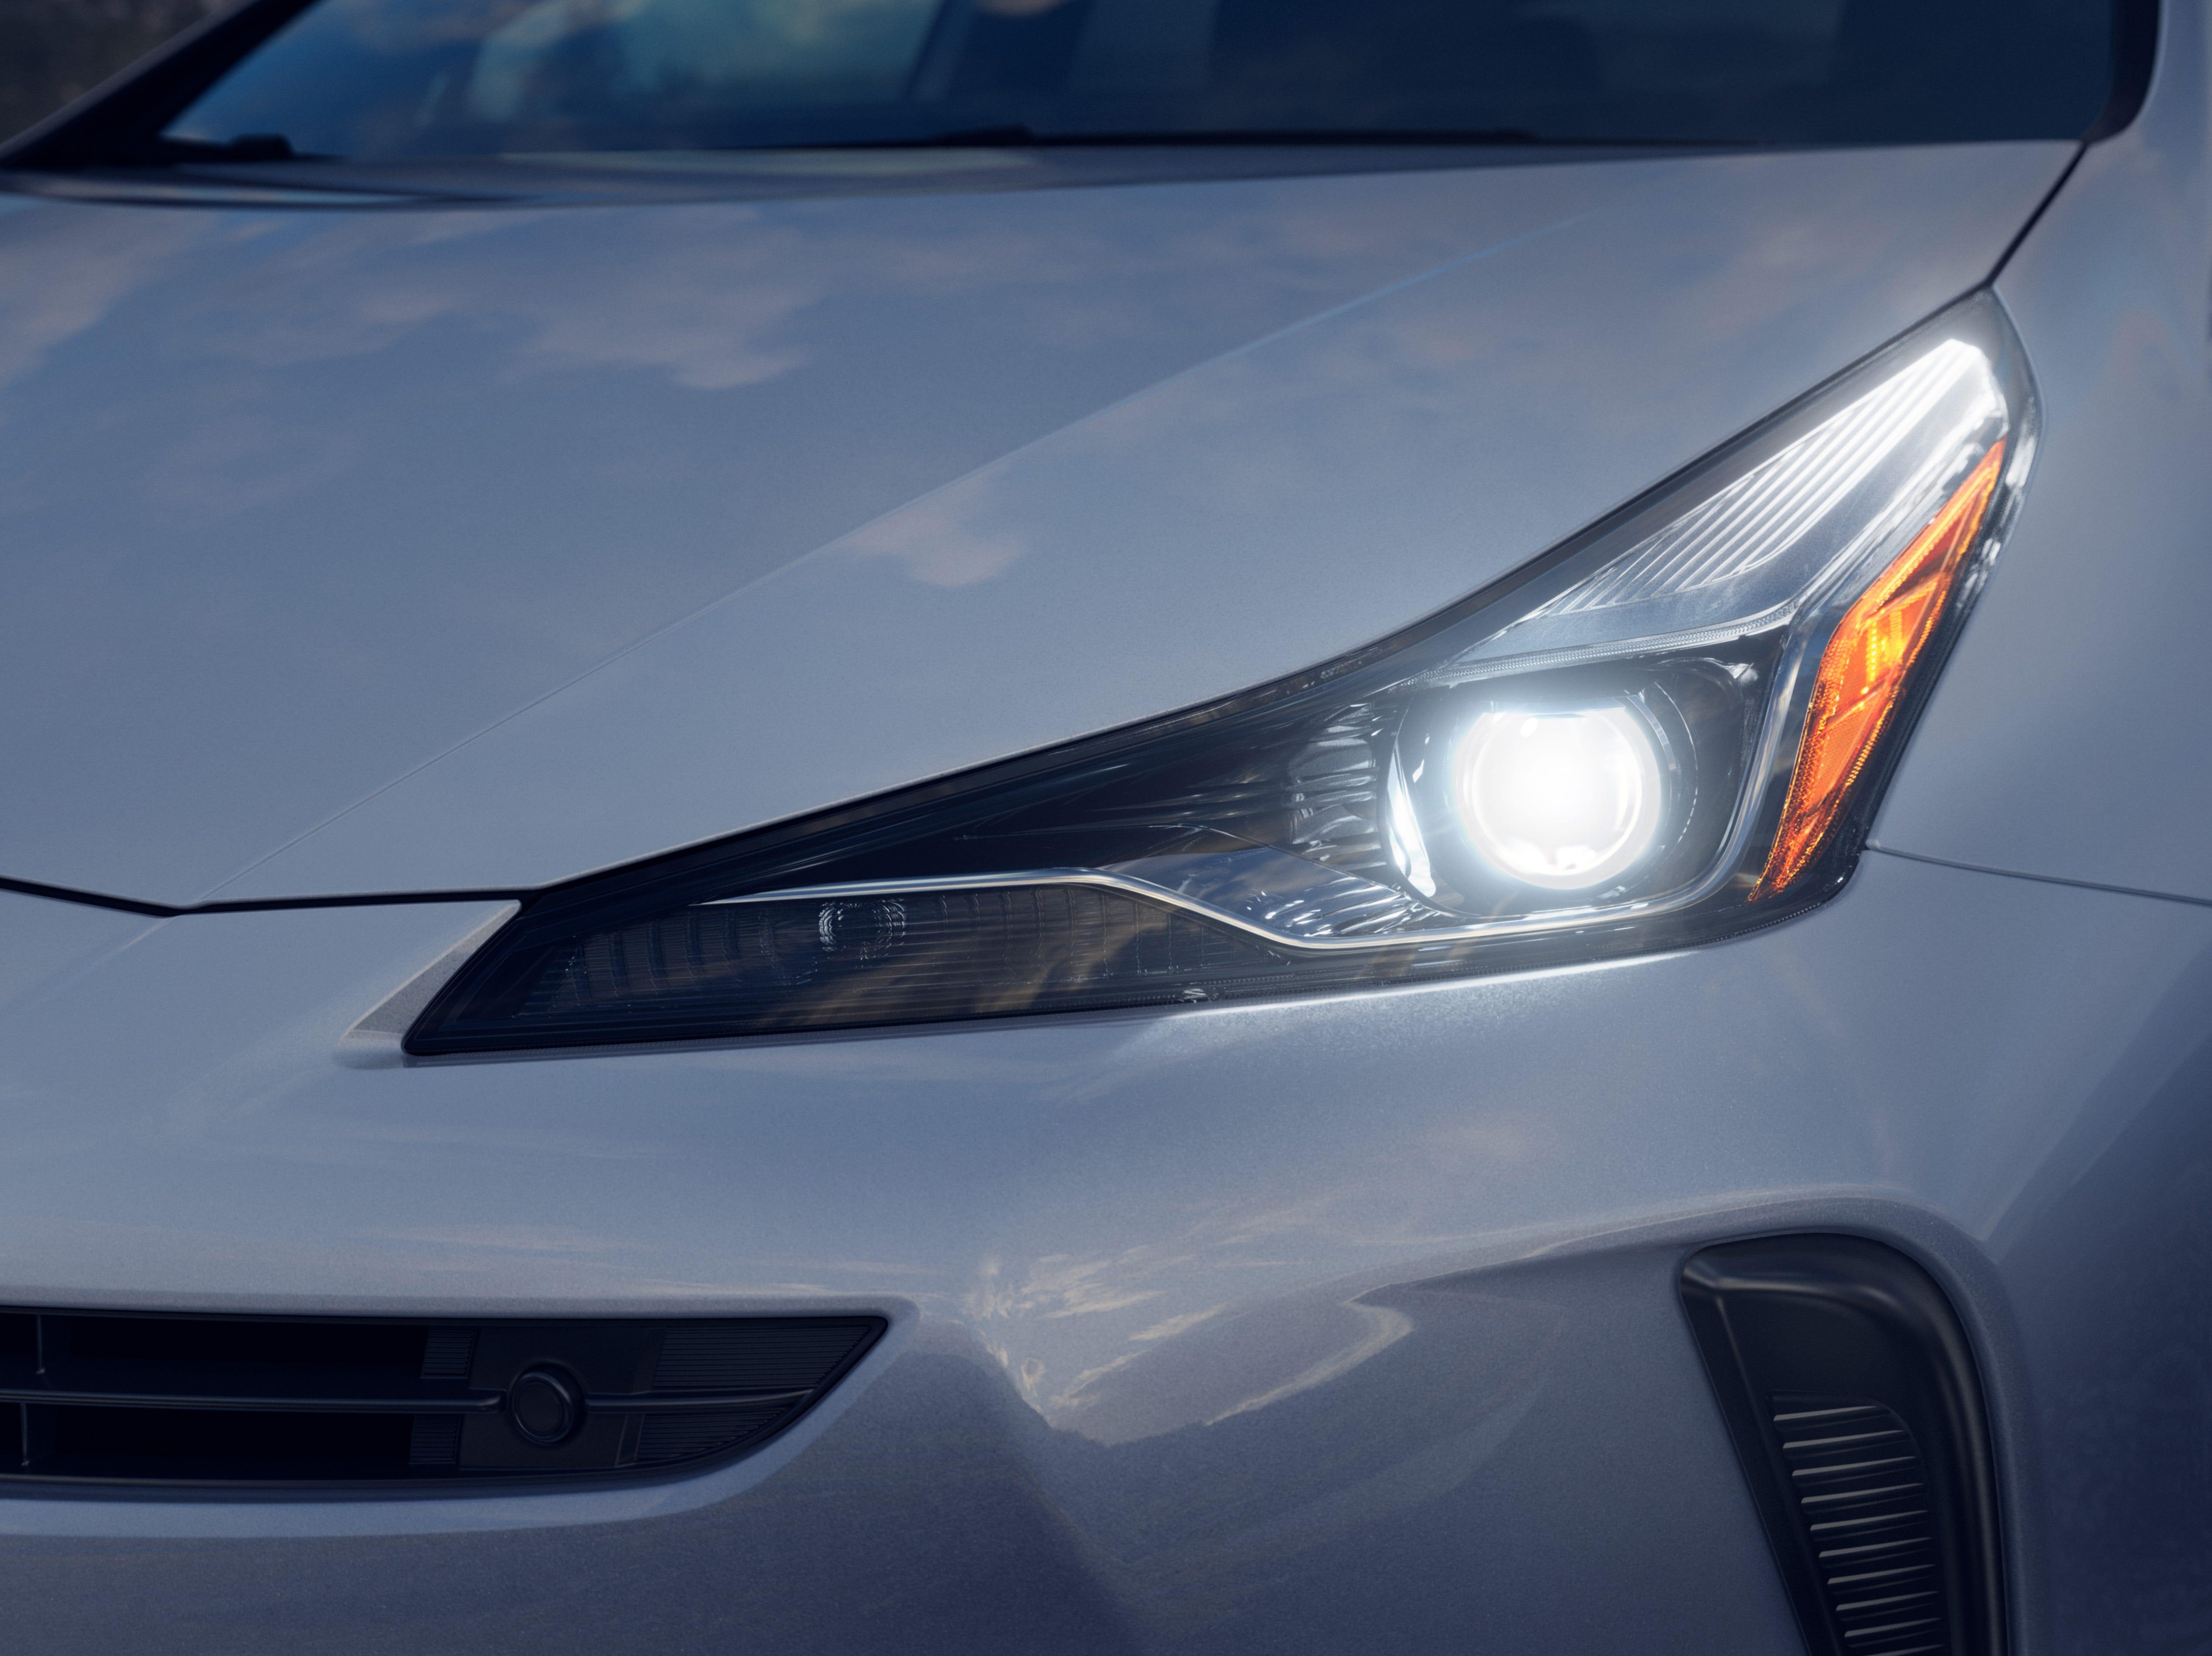 The 2019 Toyota Prius